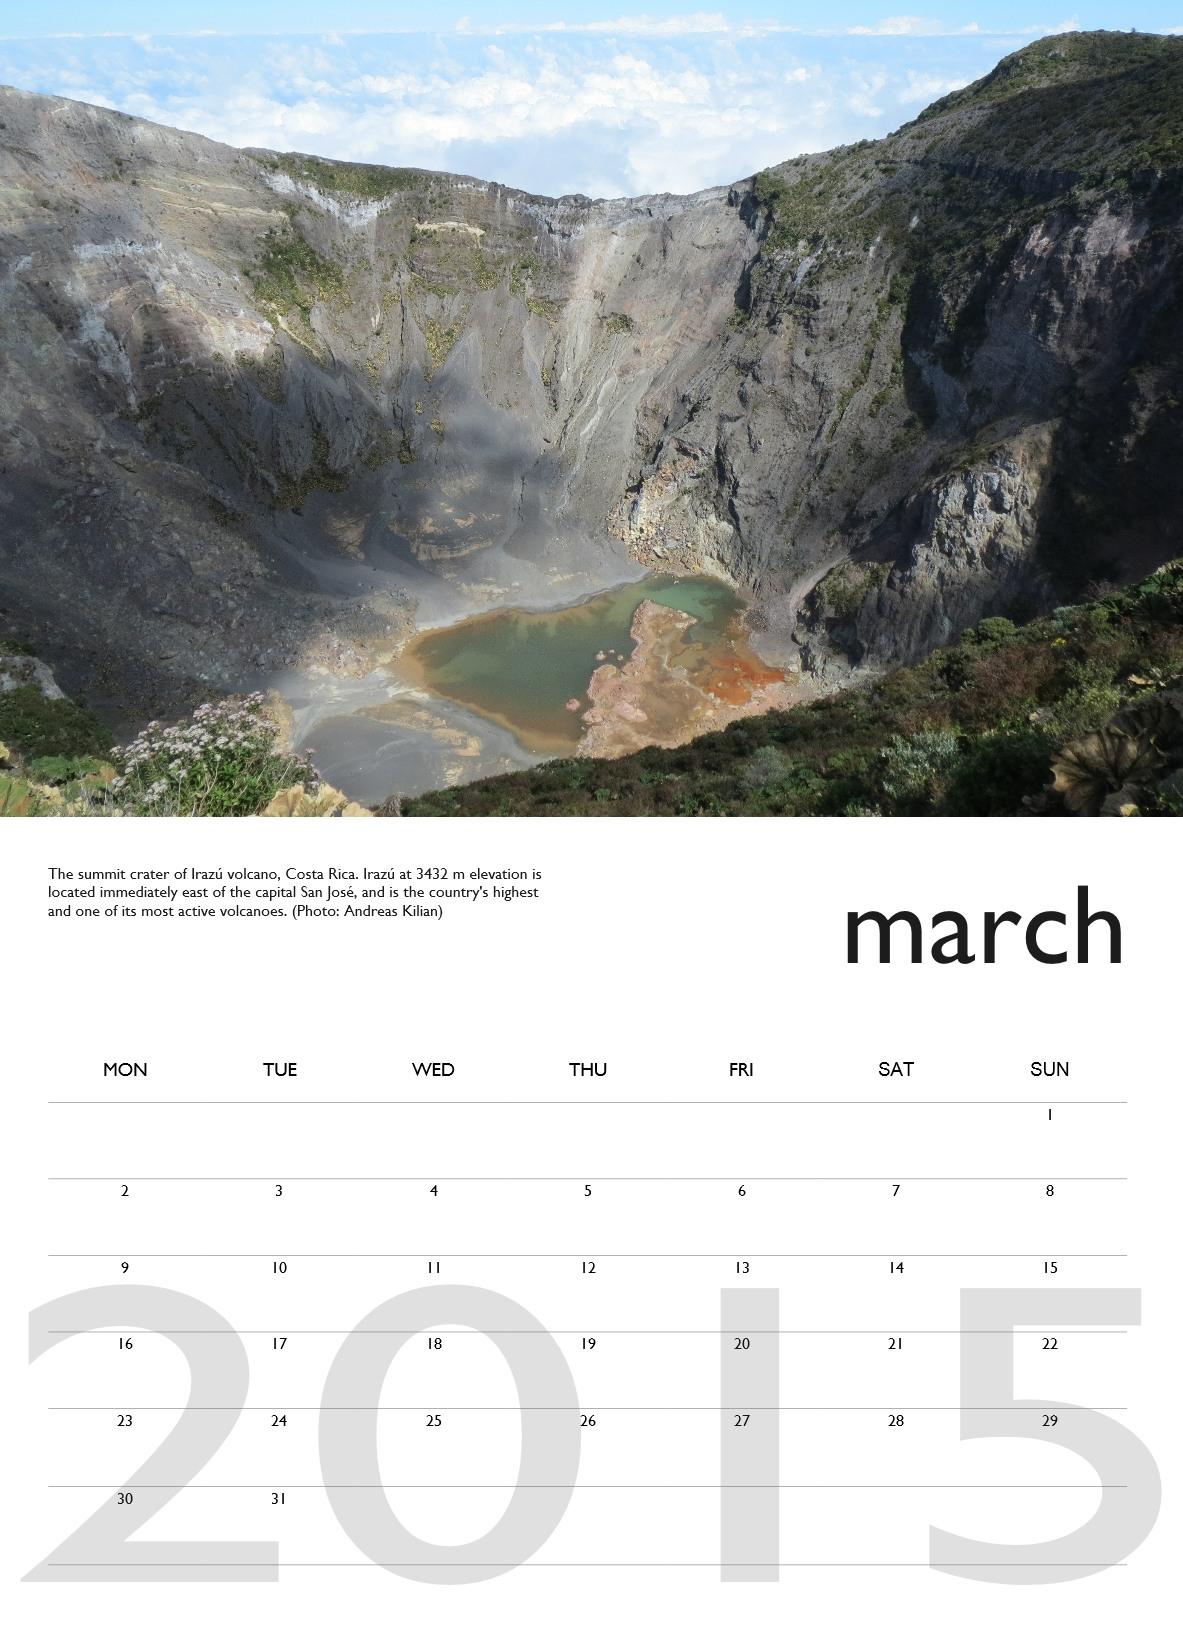 Volcano calendar 2015 - March preview